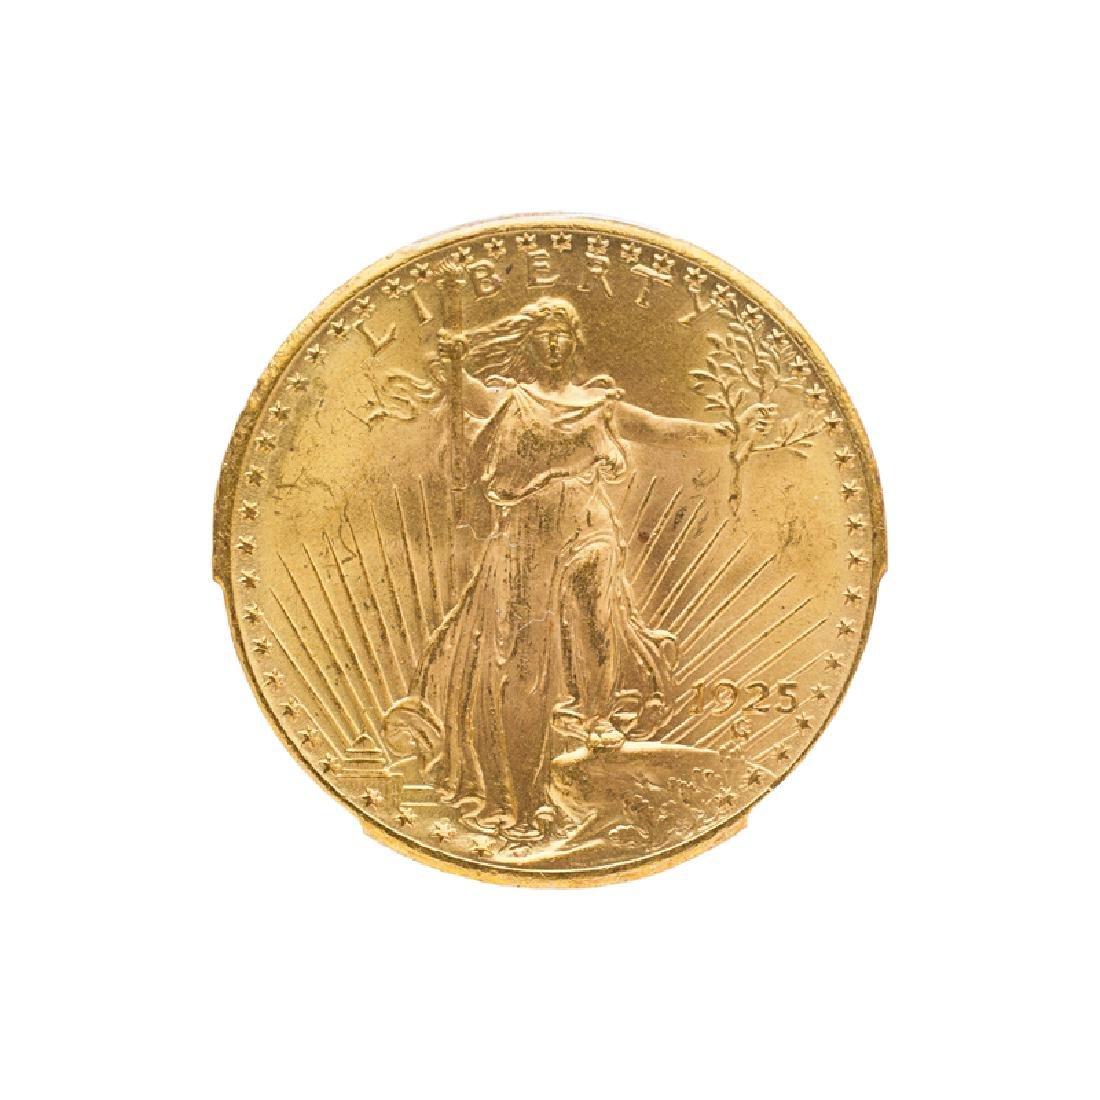 1925 ST. GAUDENS $20.00 GOLD COIN